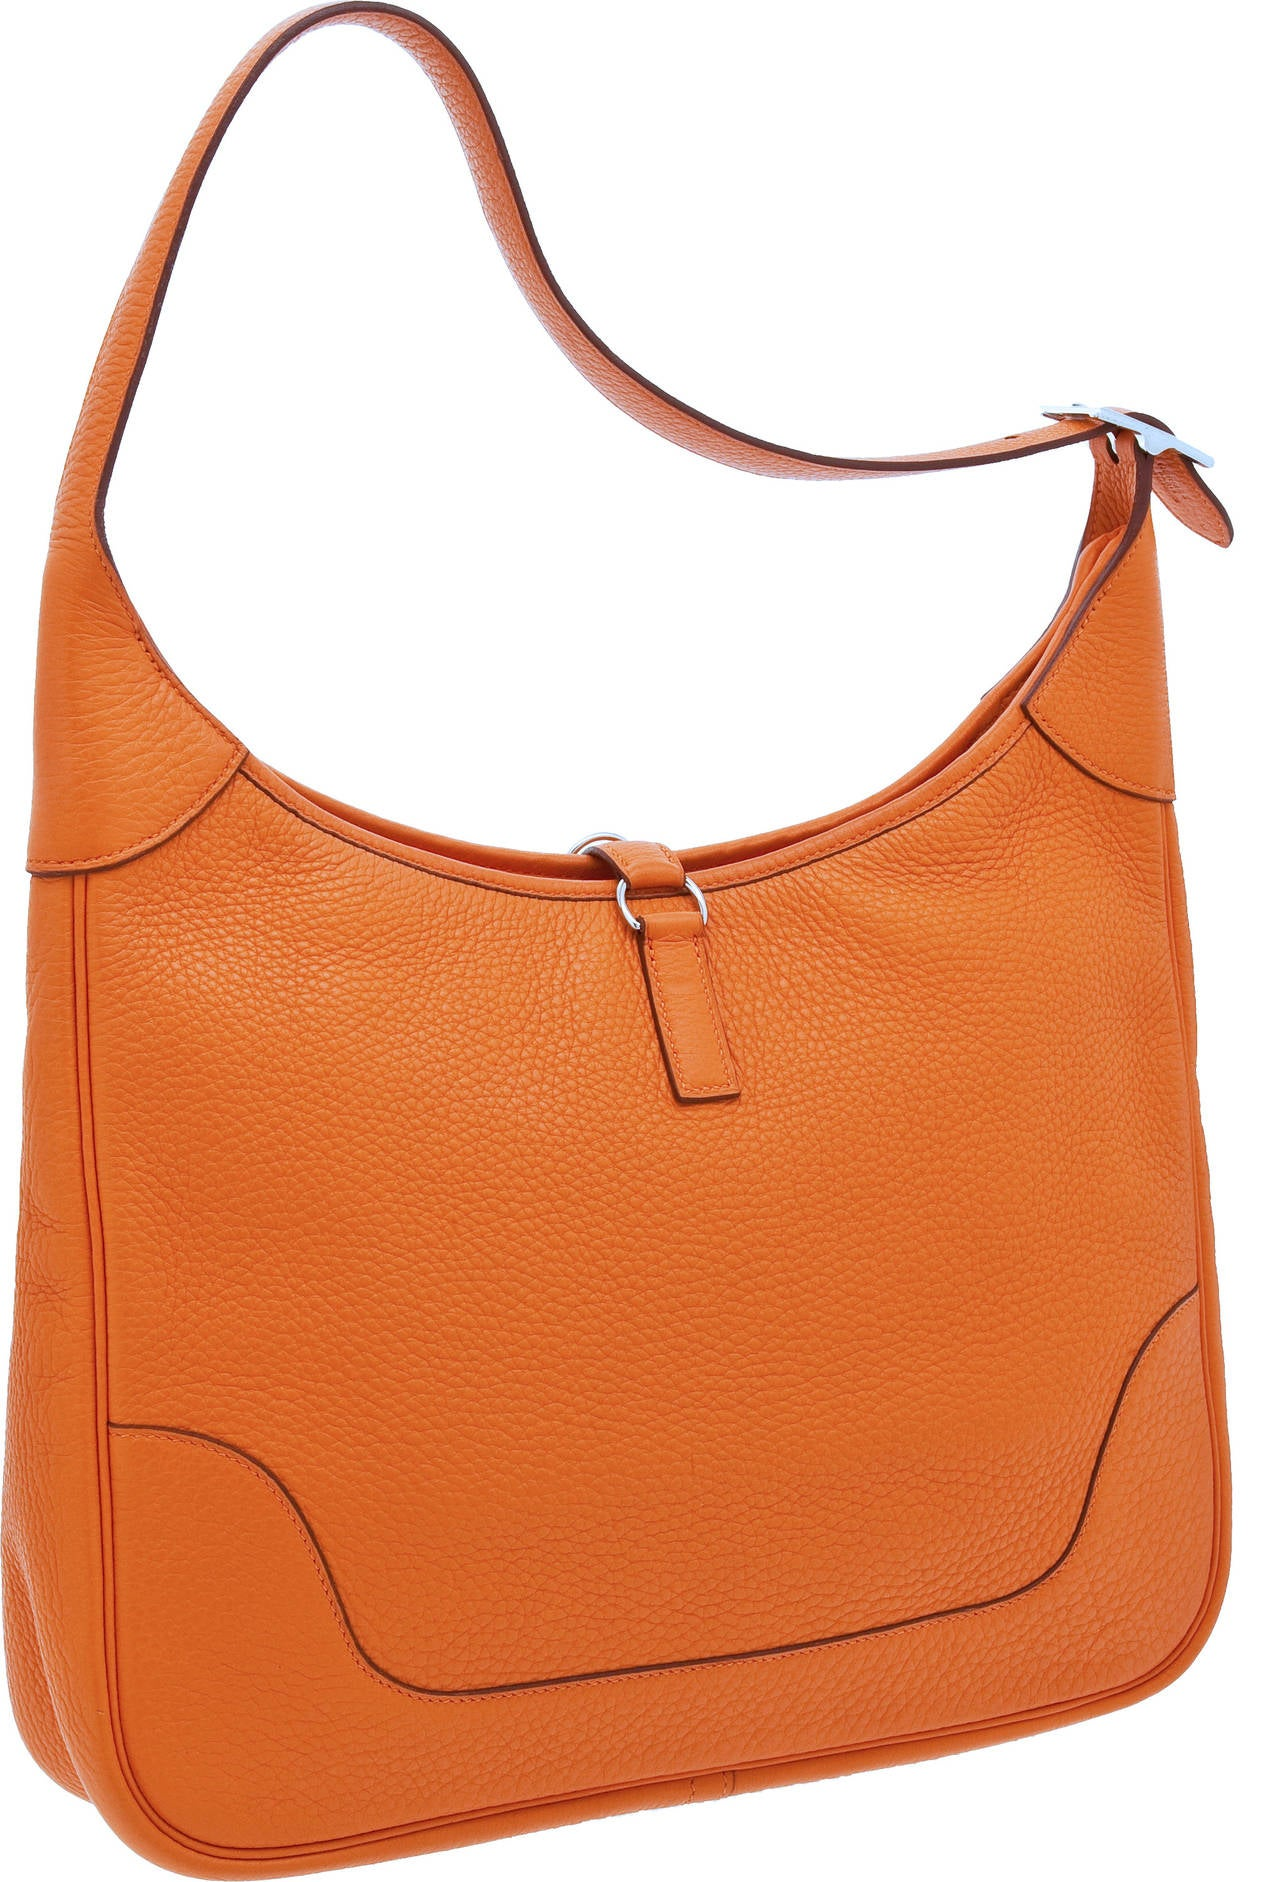 2002 Hermes 35cm Orange H Clemence Leather Trim Bag w/Palladium ...